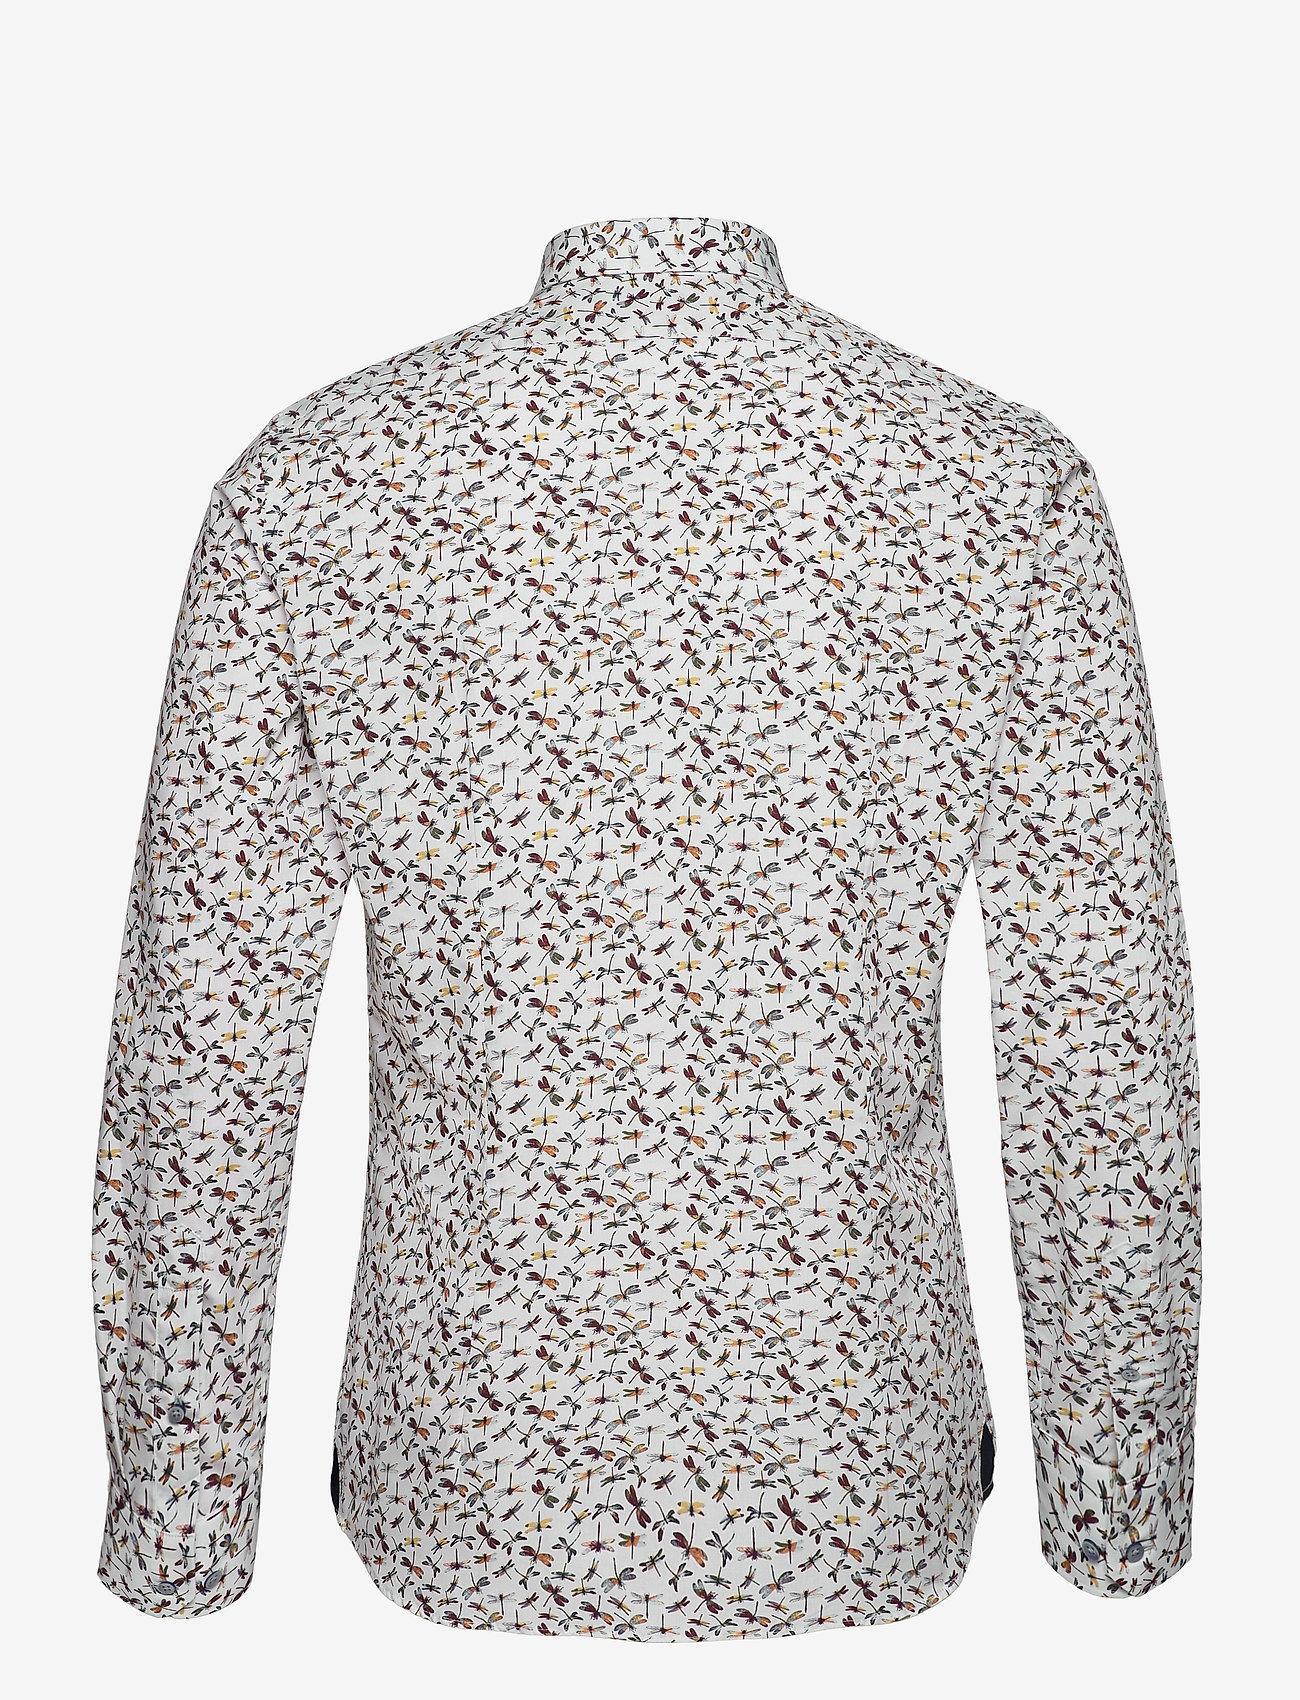 XO Shirtmaker by Sand Copenhagen - 8745 - Gordon SC - business skjortor - pattern - 1